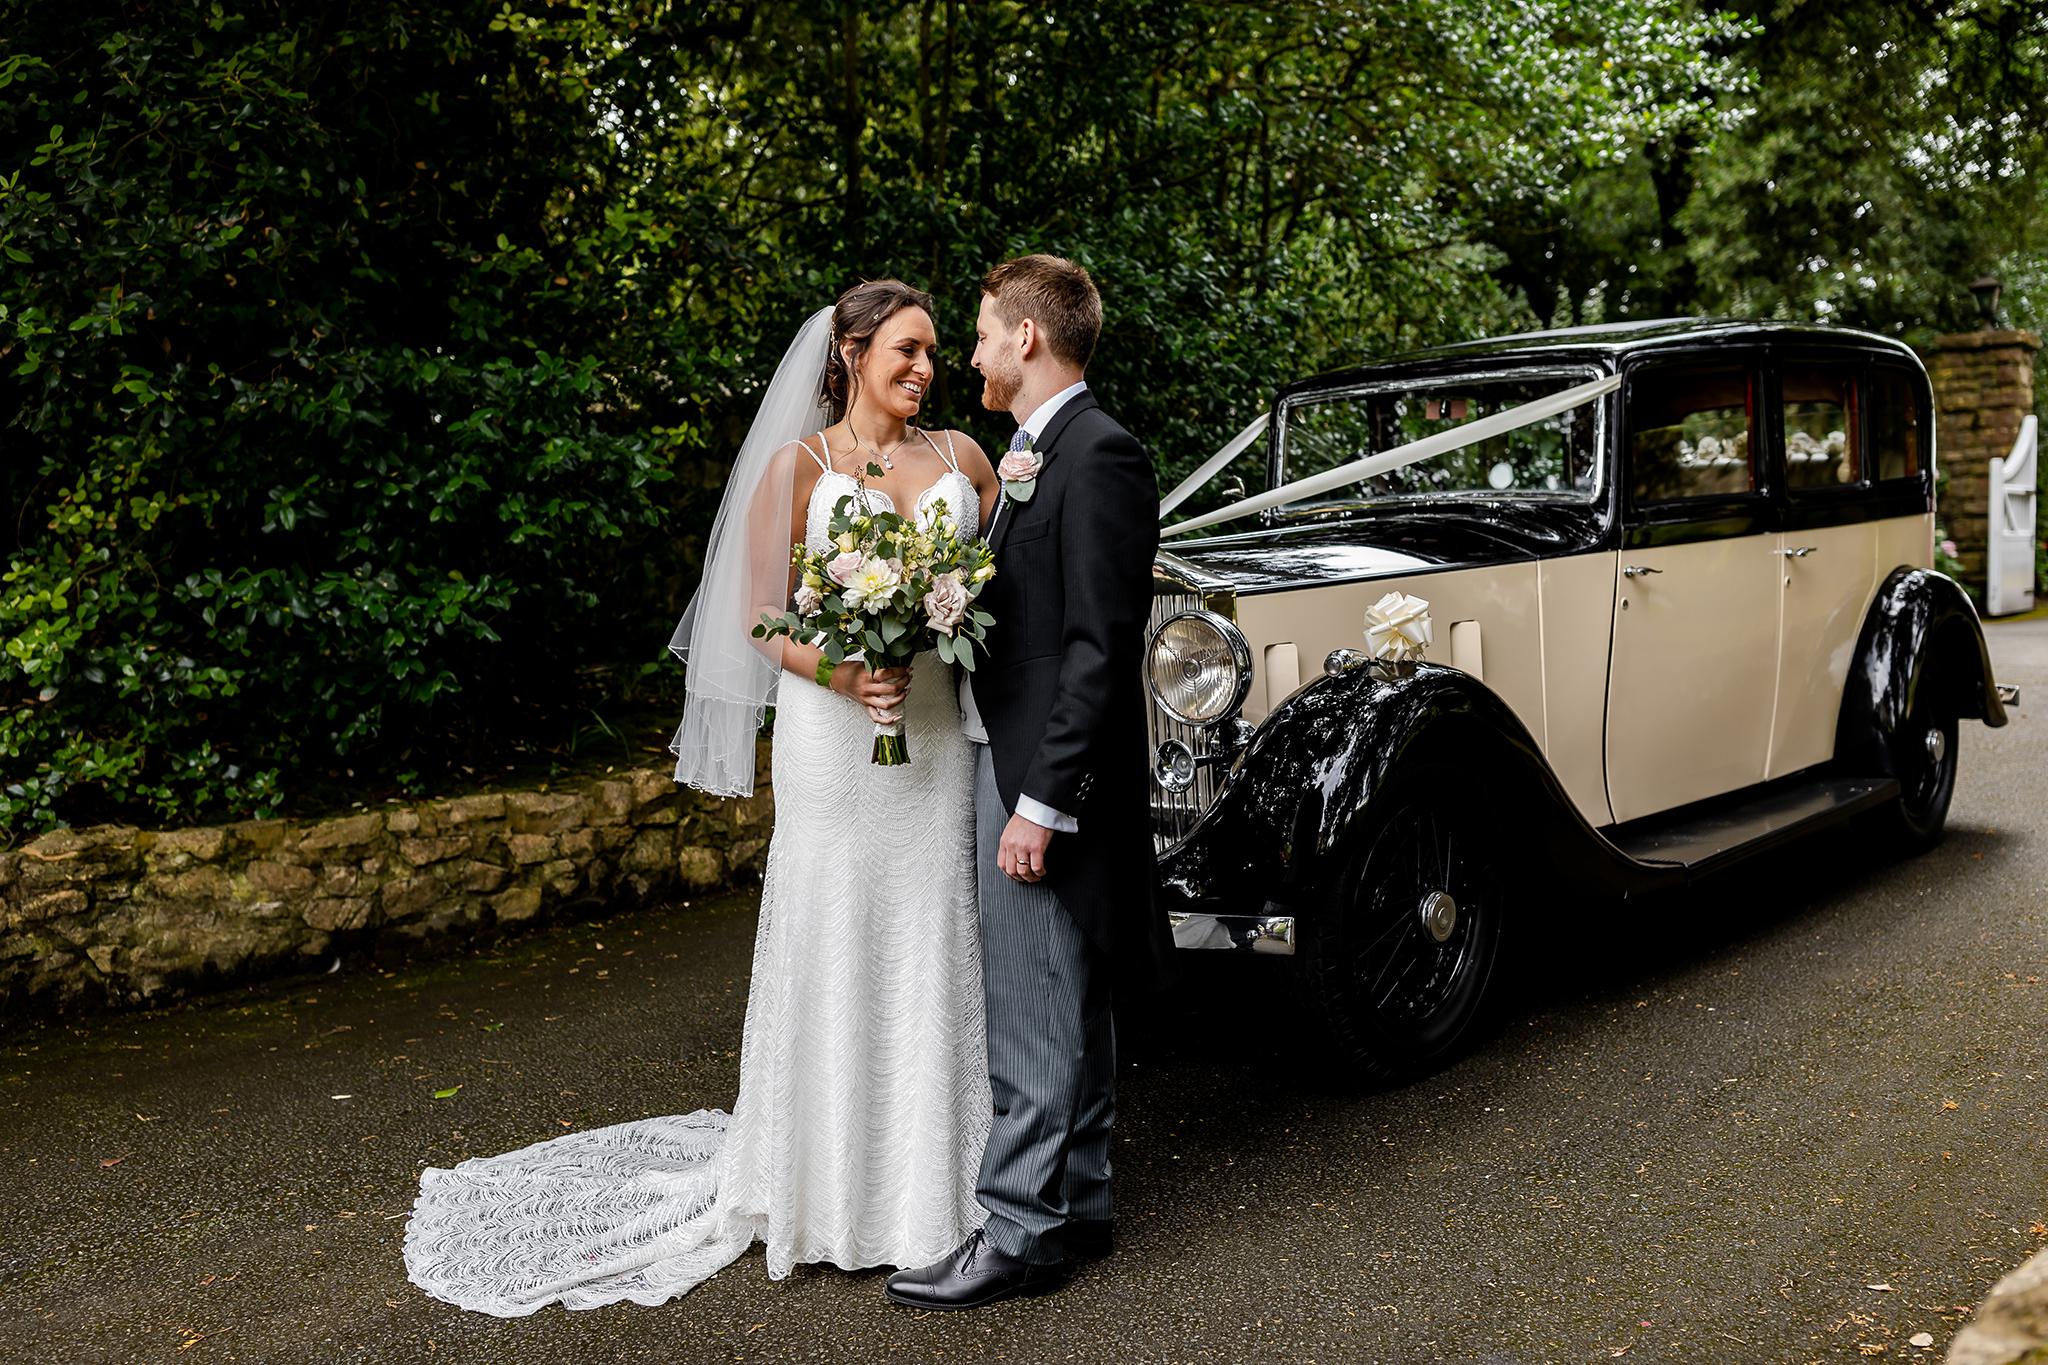 Fonmon Caslte - Bride and Groom and wedding car